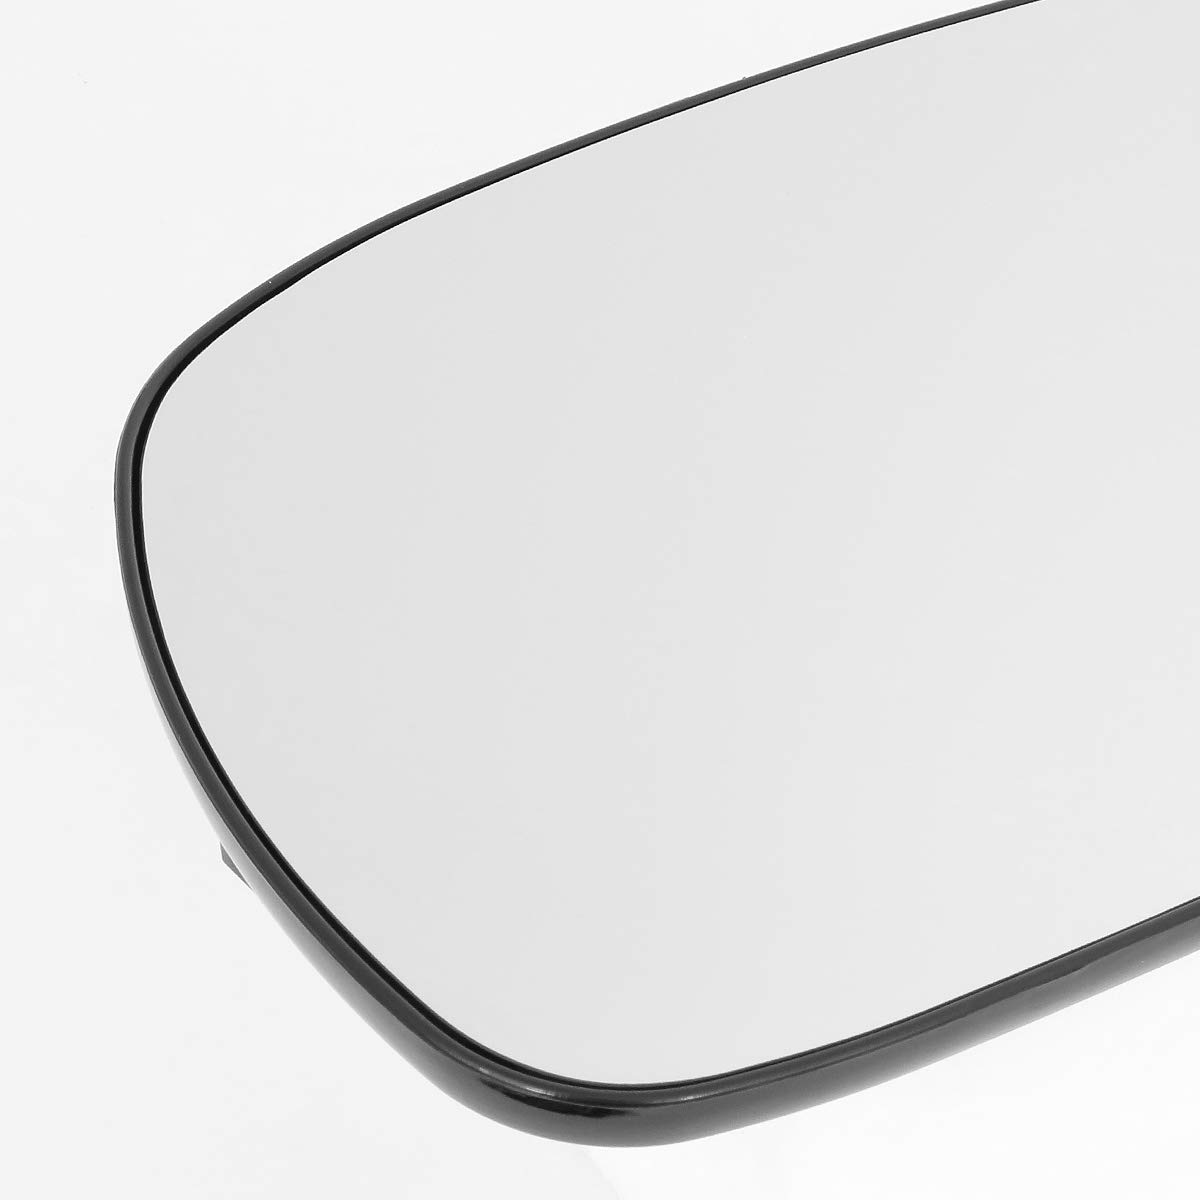 DNA Motoring SMP-057-L Left//Driver Side Door Rear View Mirror Glass Lens w//Heater